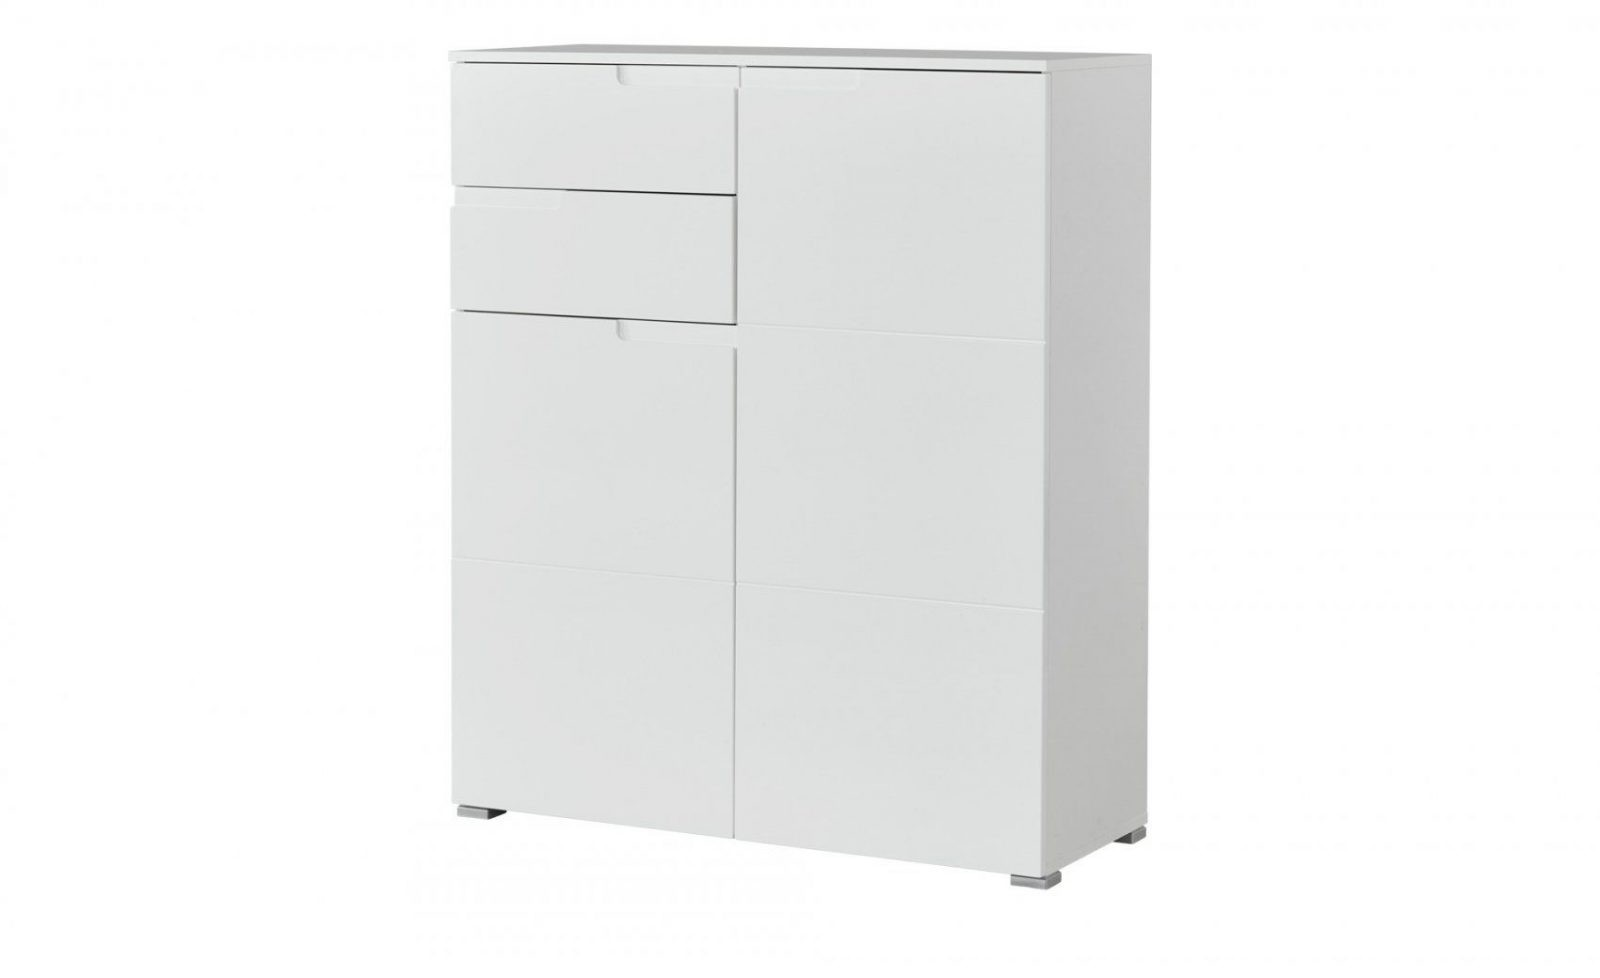 sideboard 100 cm breit haus design ideen. Black Bedroom Furniture Sets. Home Design Ideas